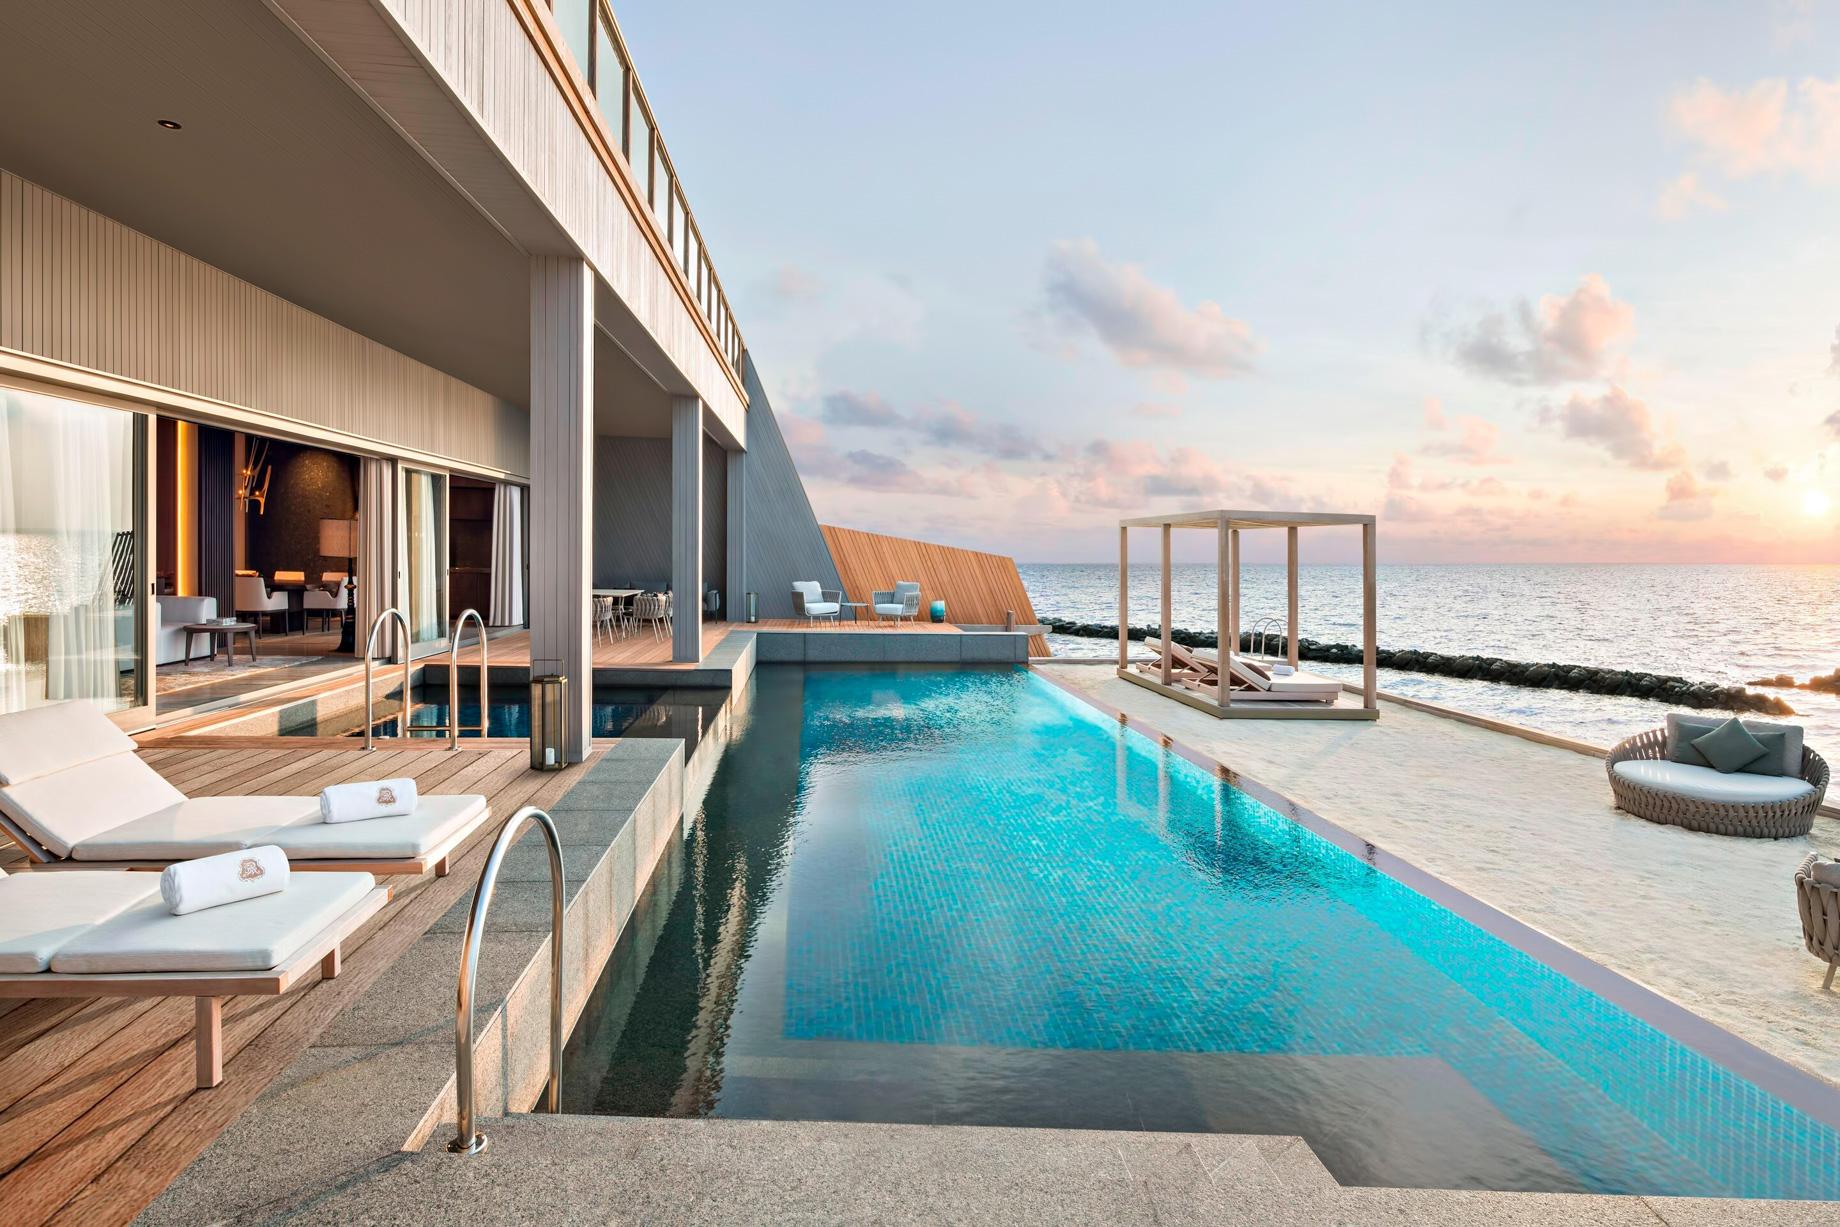 The St. Regis Maldives Vommuli Luxury Resort – Dhaalu Atoll, Maldives – John Jacob Astor Estate Pool Terrace